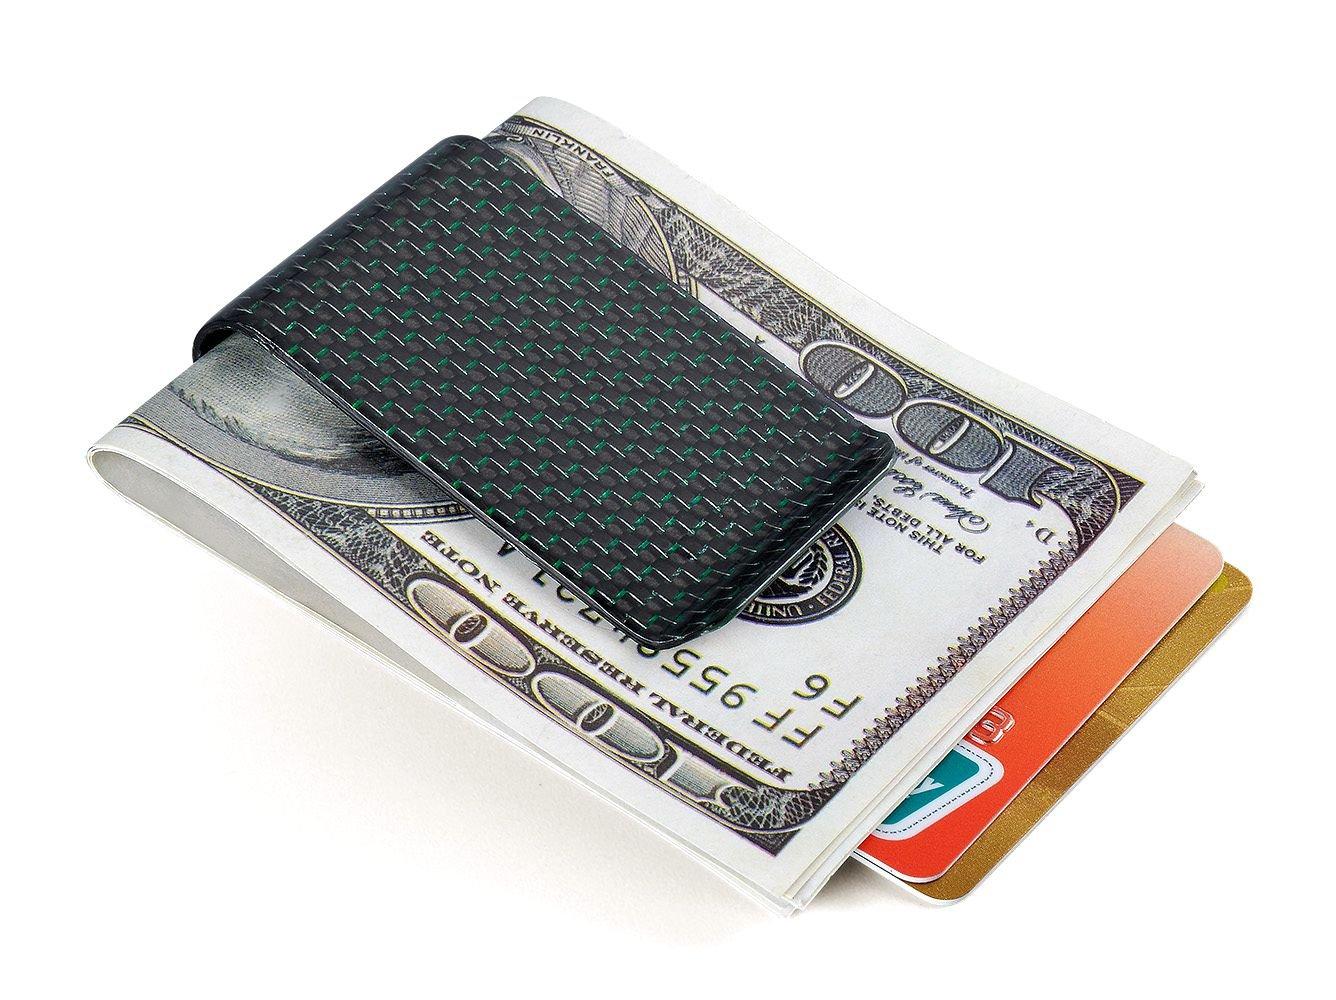 Glossy Money Clip Credit Card Business Card Holder Carbon Fiber Wallet CL Carbonlife GREEN M